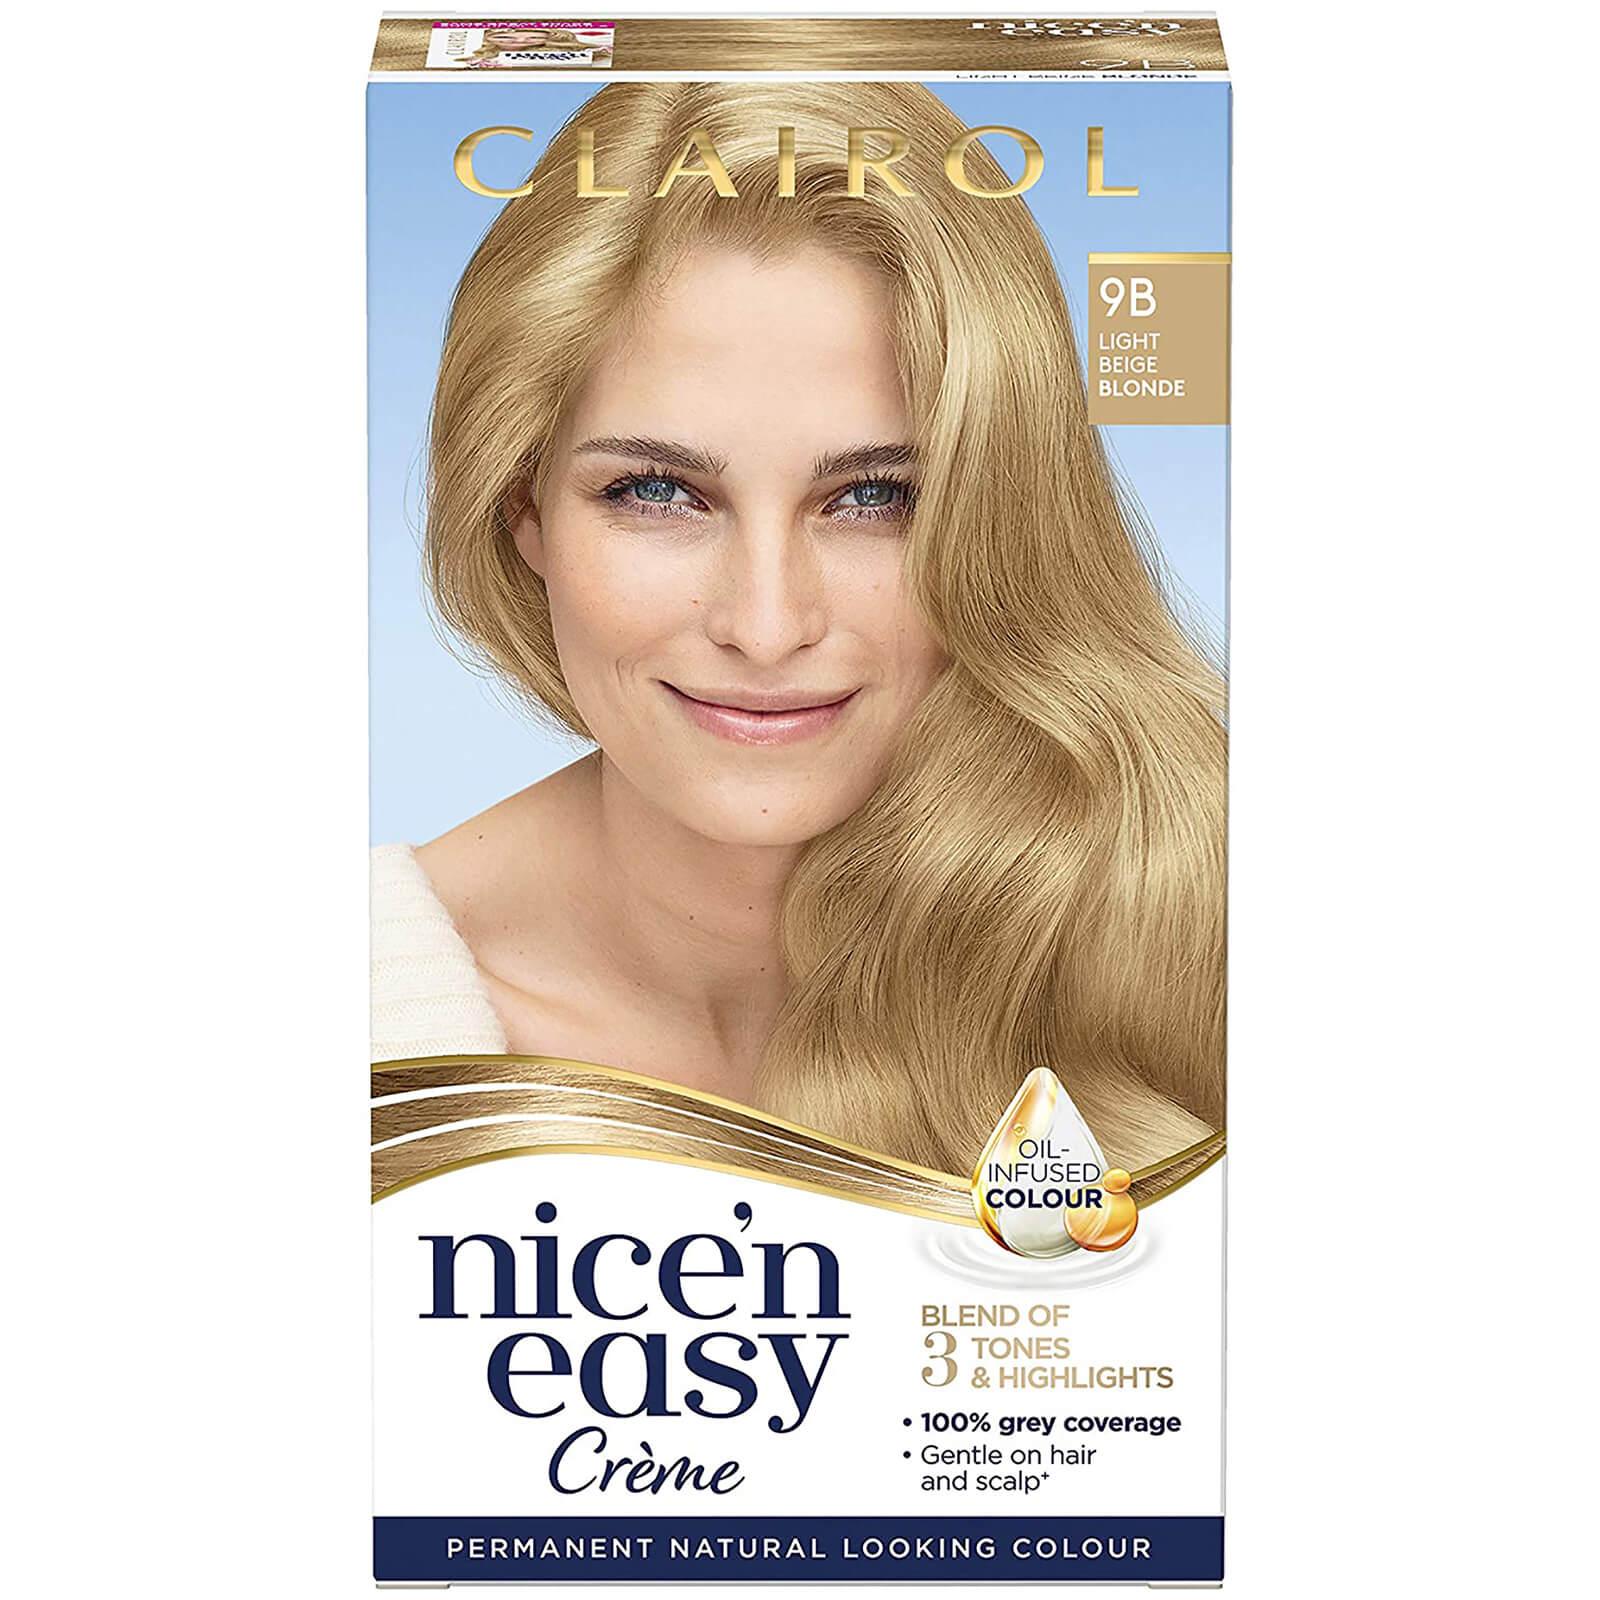 Clairol Nice' n Easy Crème Natural Looking Oil Infused Permanent Hair Dye 177ml (Various Shades) - 9B Light Beige Blonde